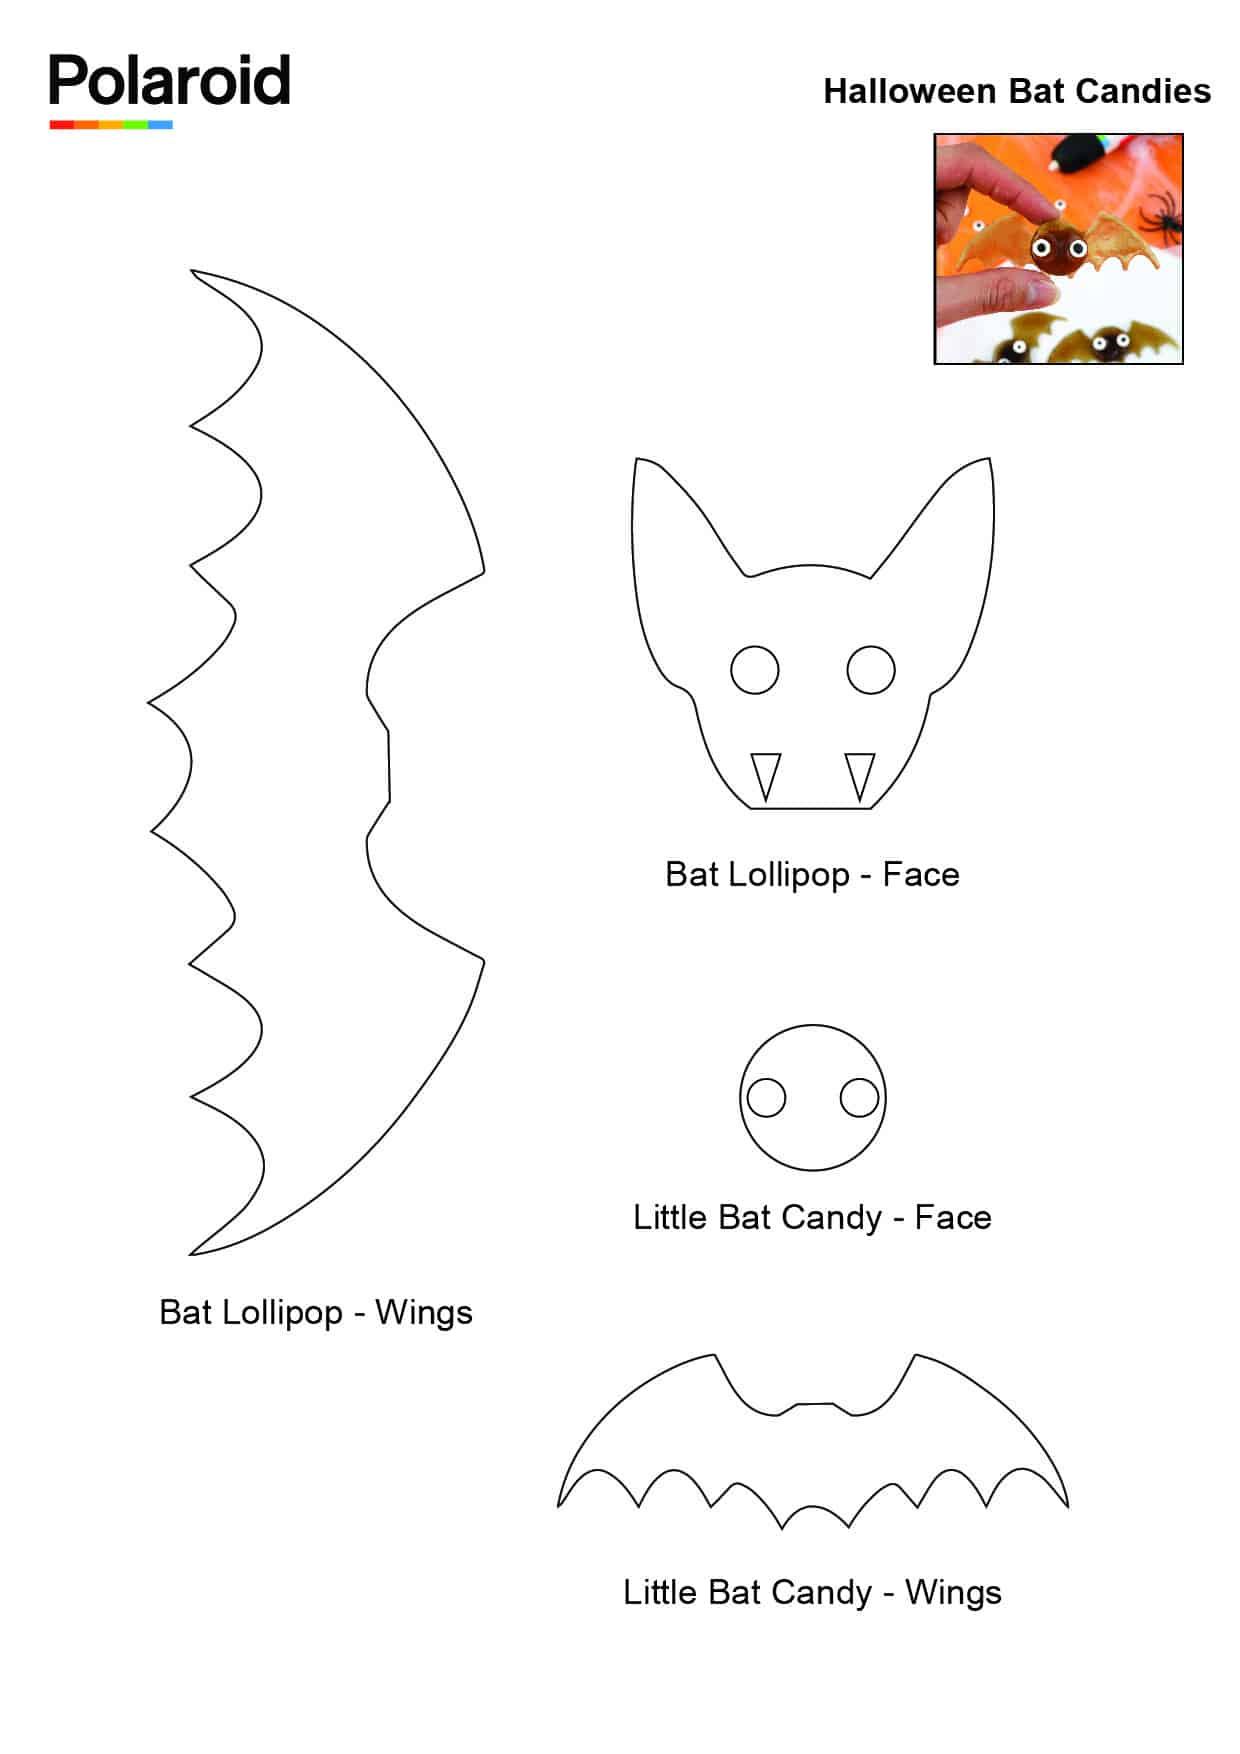 Candy Pen Stencil – Halloween Bat Candies